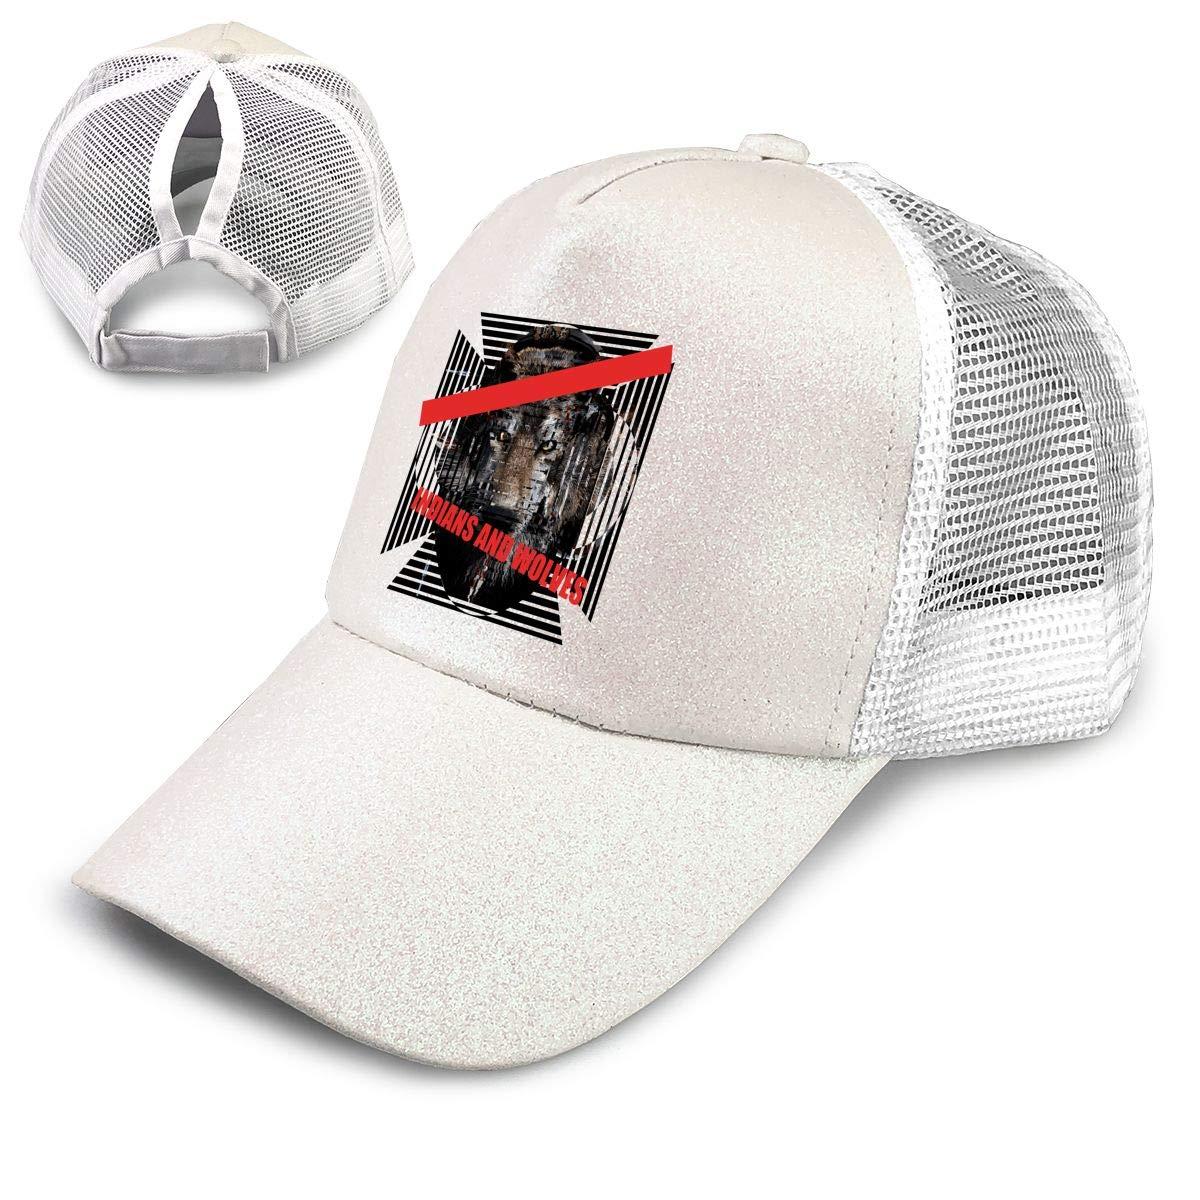 Malaysia Heart Ponytail Messy High Bun Hat Ponycaps Baseball Cap Adjustable Trucker Cap Mesh Cap